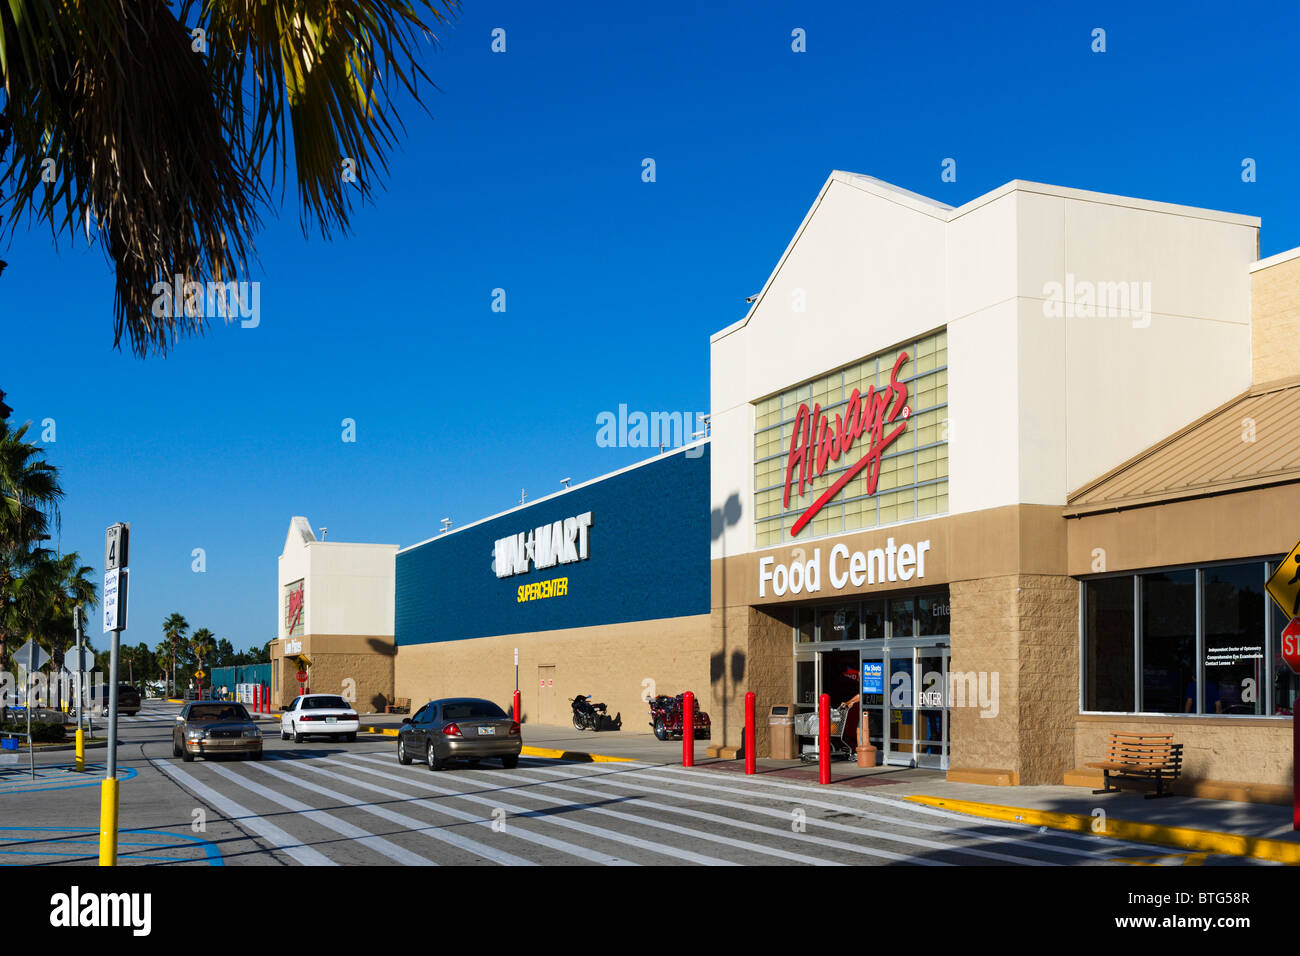 cffa4e39478d3a Walmart Supercenter in Haines City, Central Florida, USA Stock Photo ...